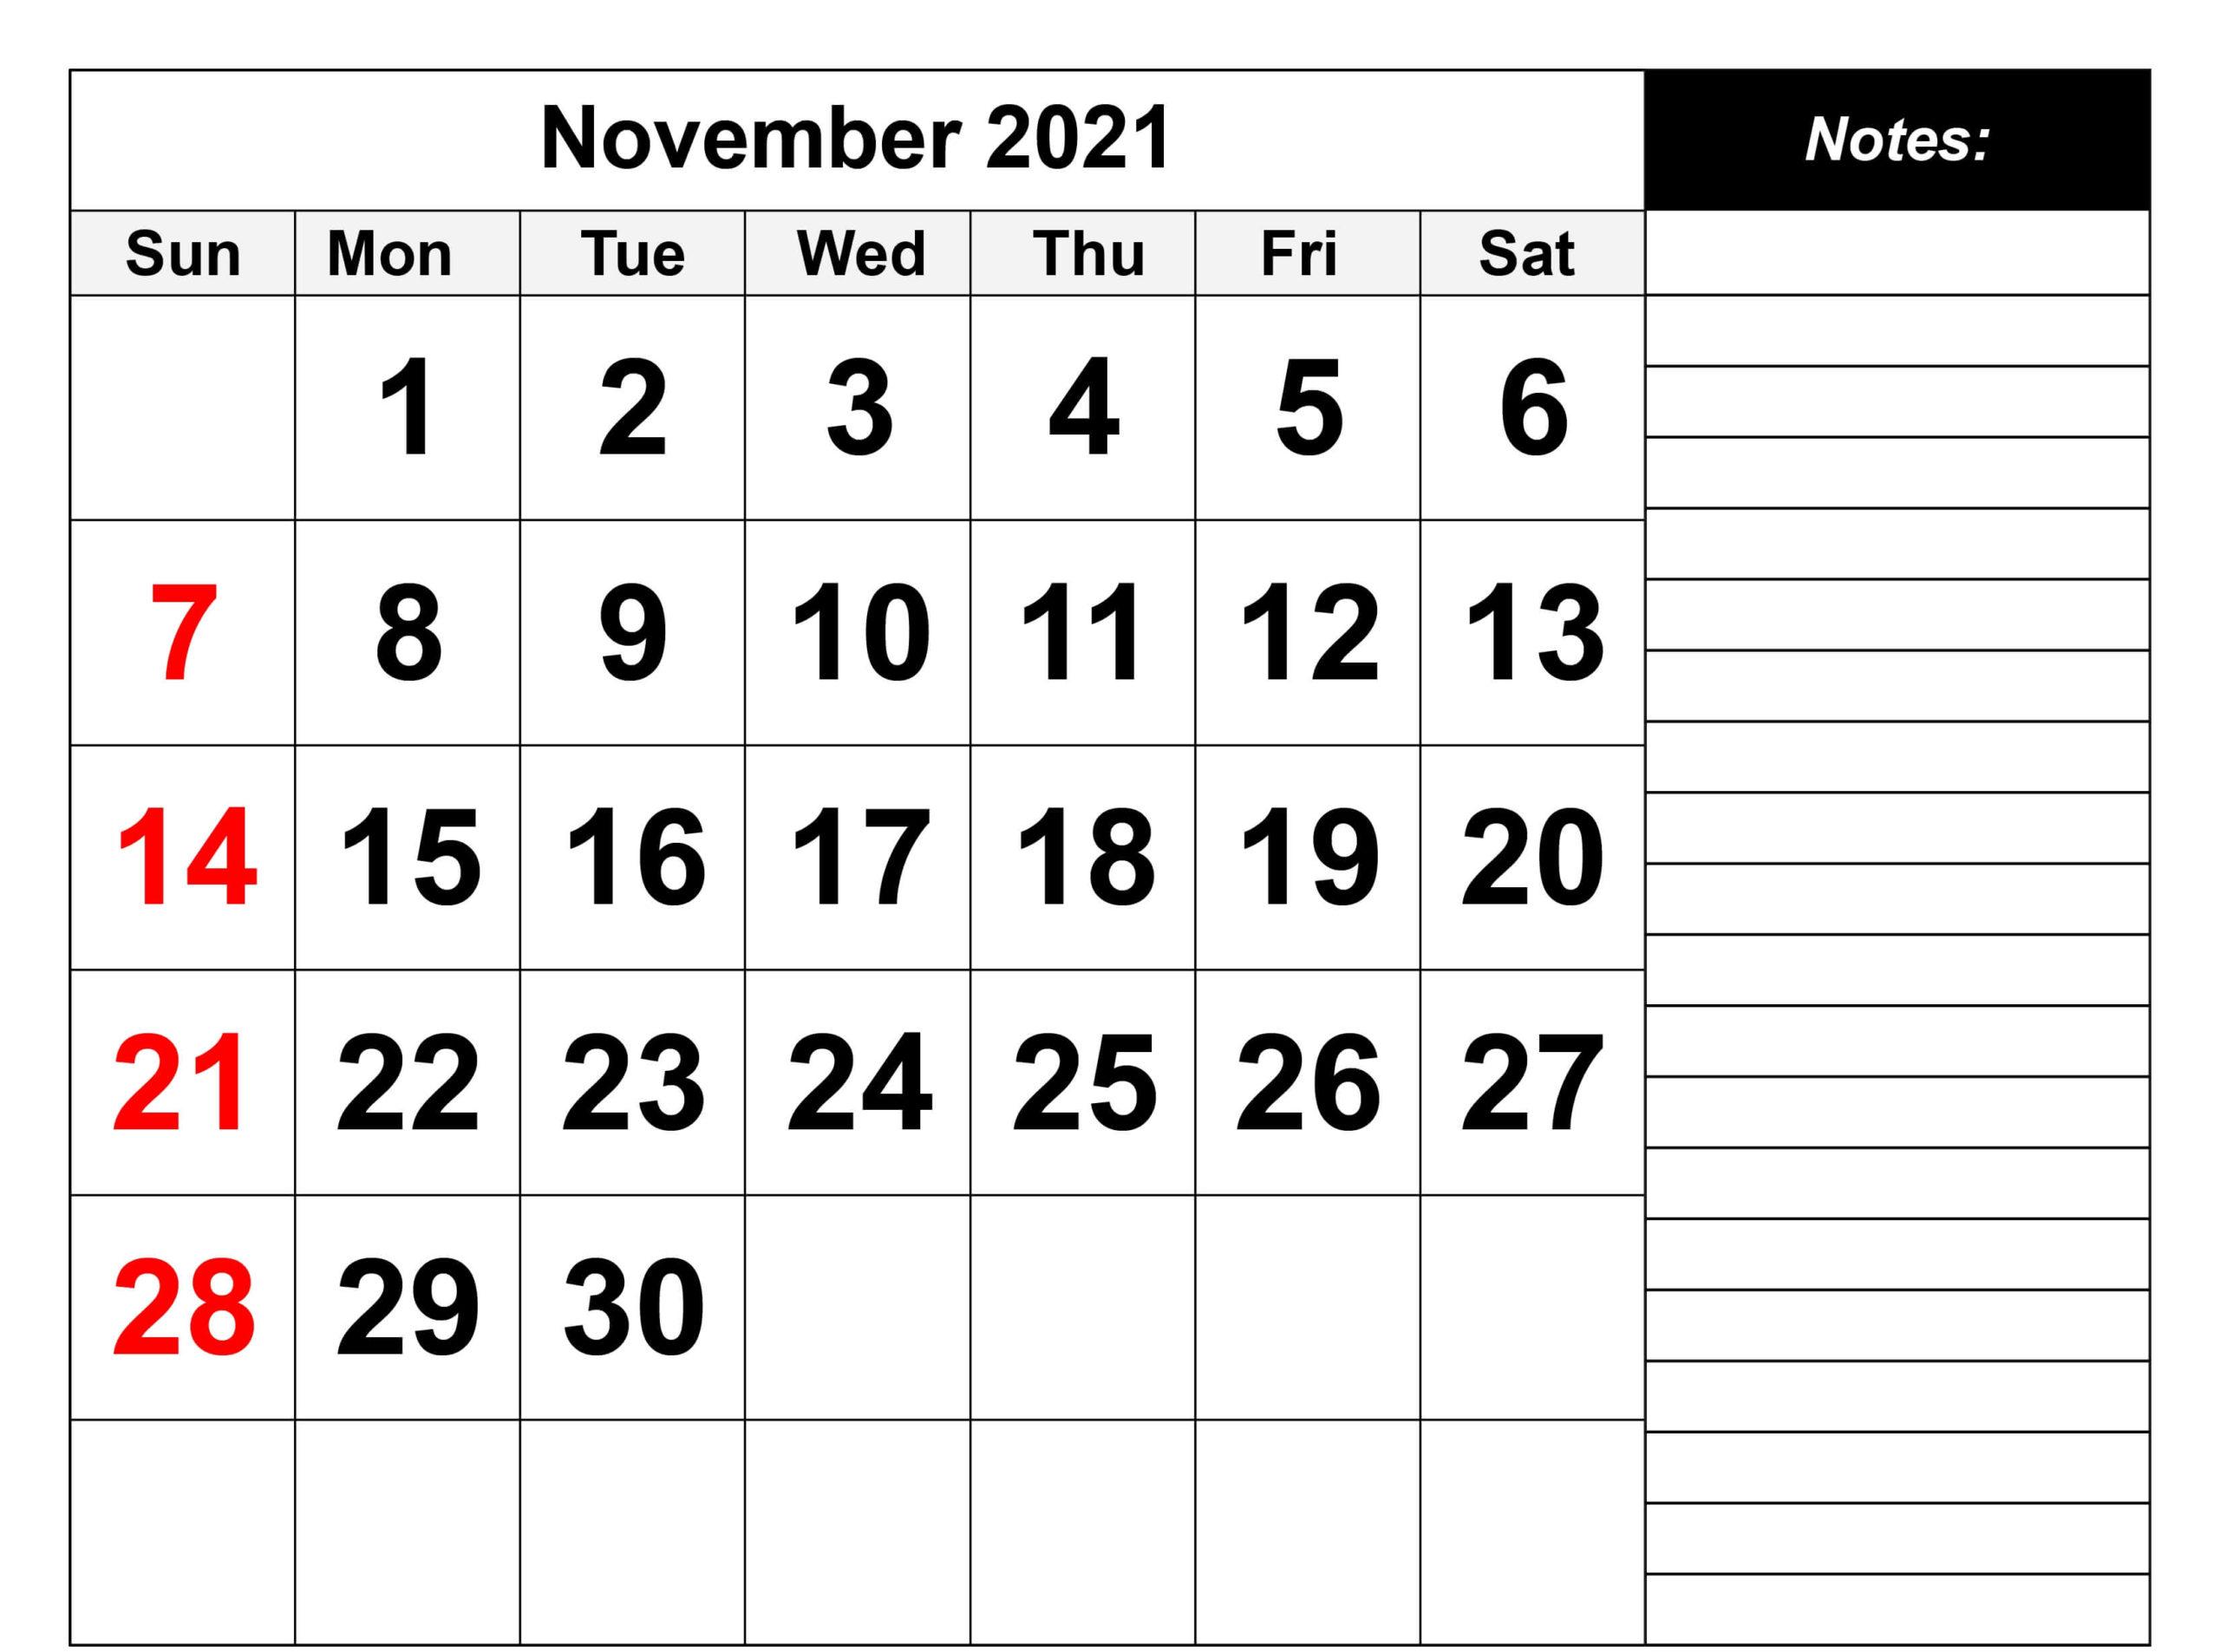 November 2021 Calendar Editable